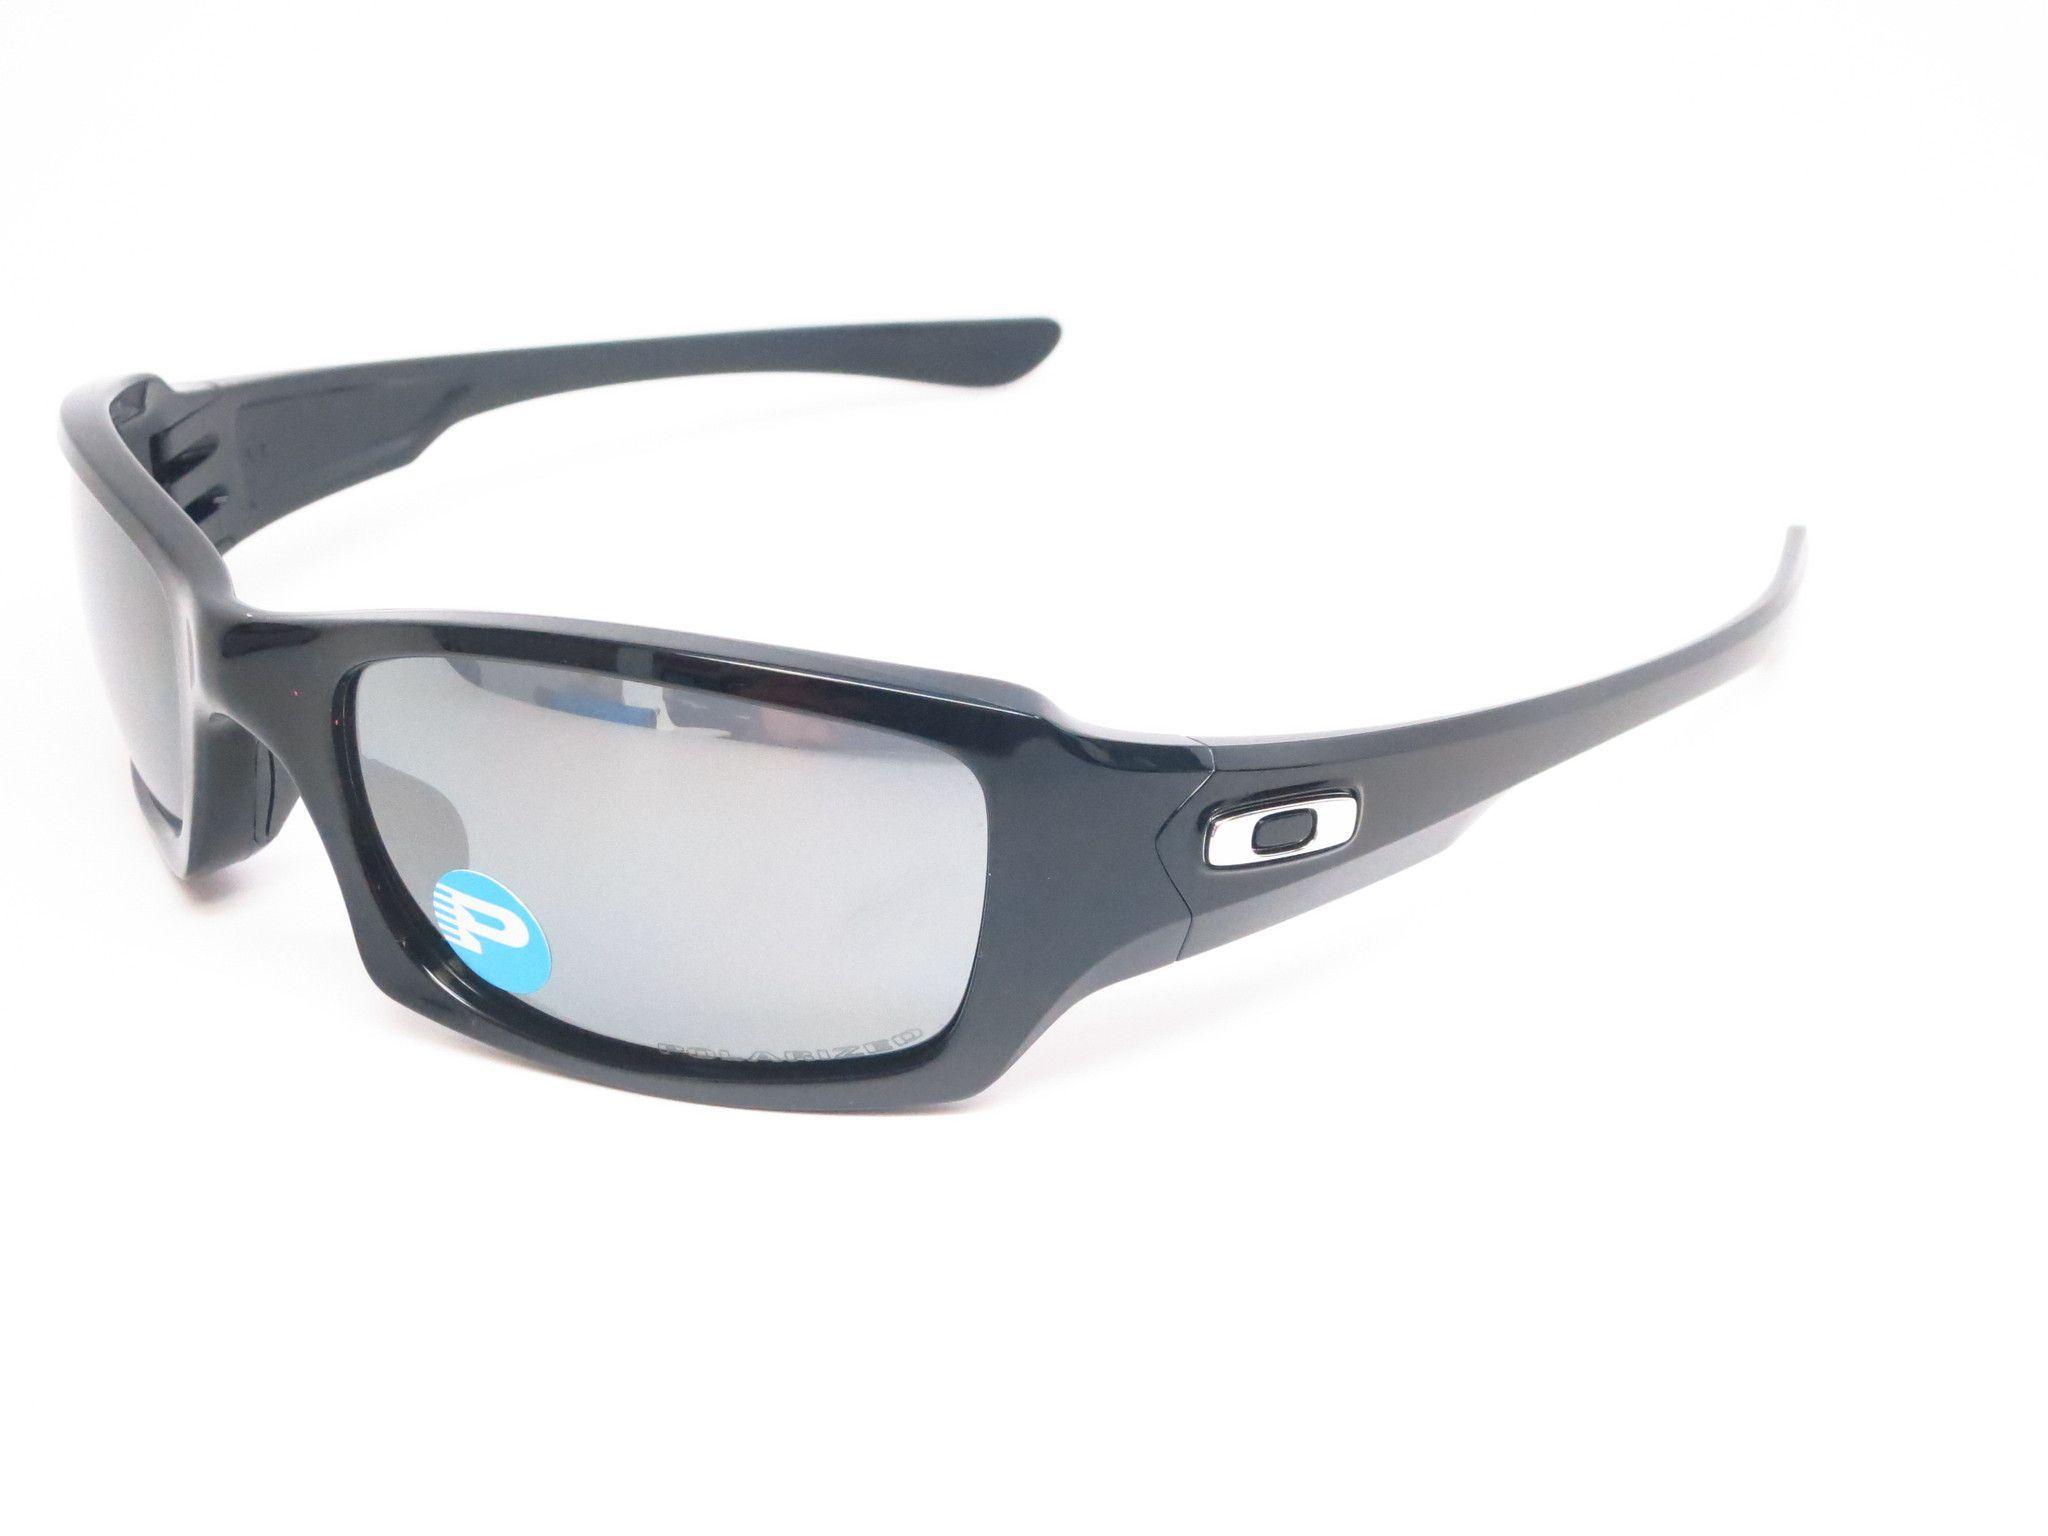 e07c975ba8047 Model Number   OO9238-06 Model Name   Fives Squared Gender   Mens Frame  Color   Polished Black Lens Color   Black Mirrored Iridium Polarized   Yes  Size ...